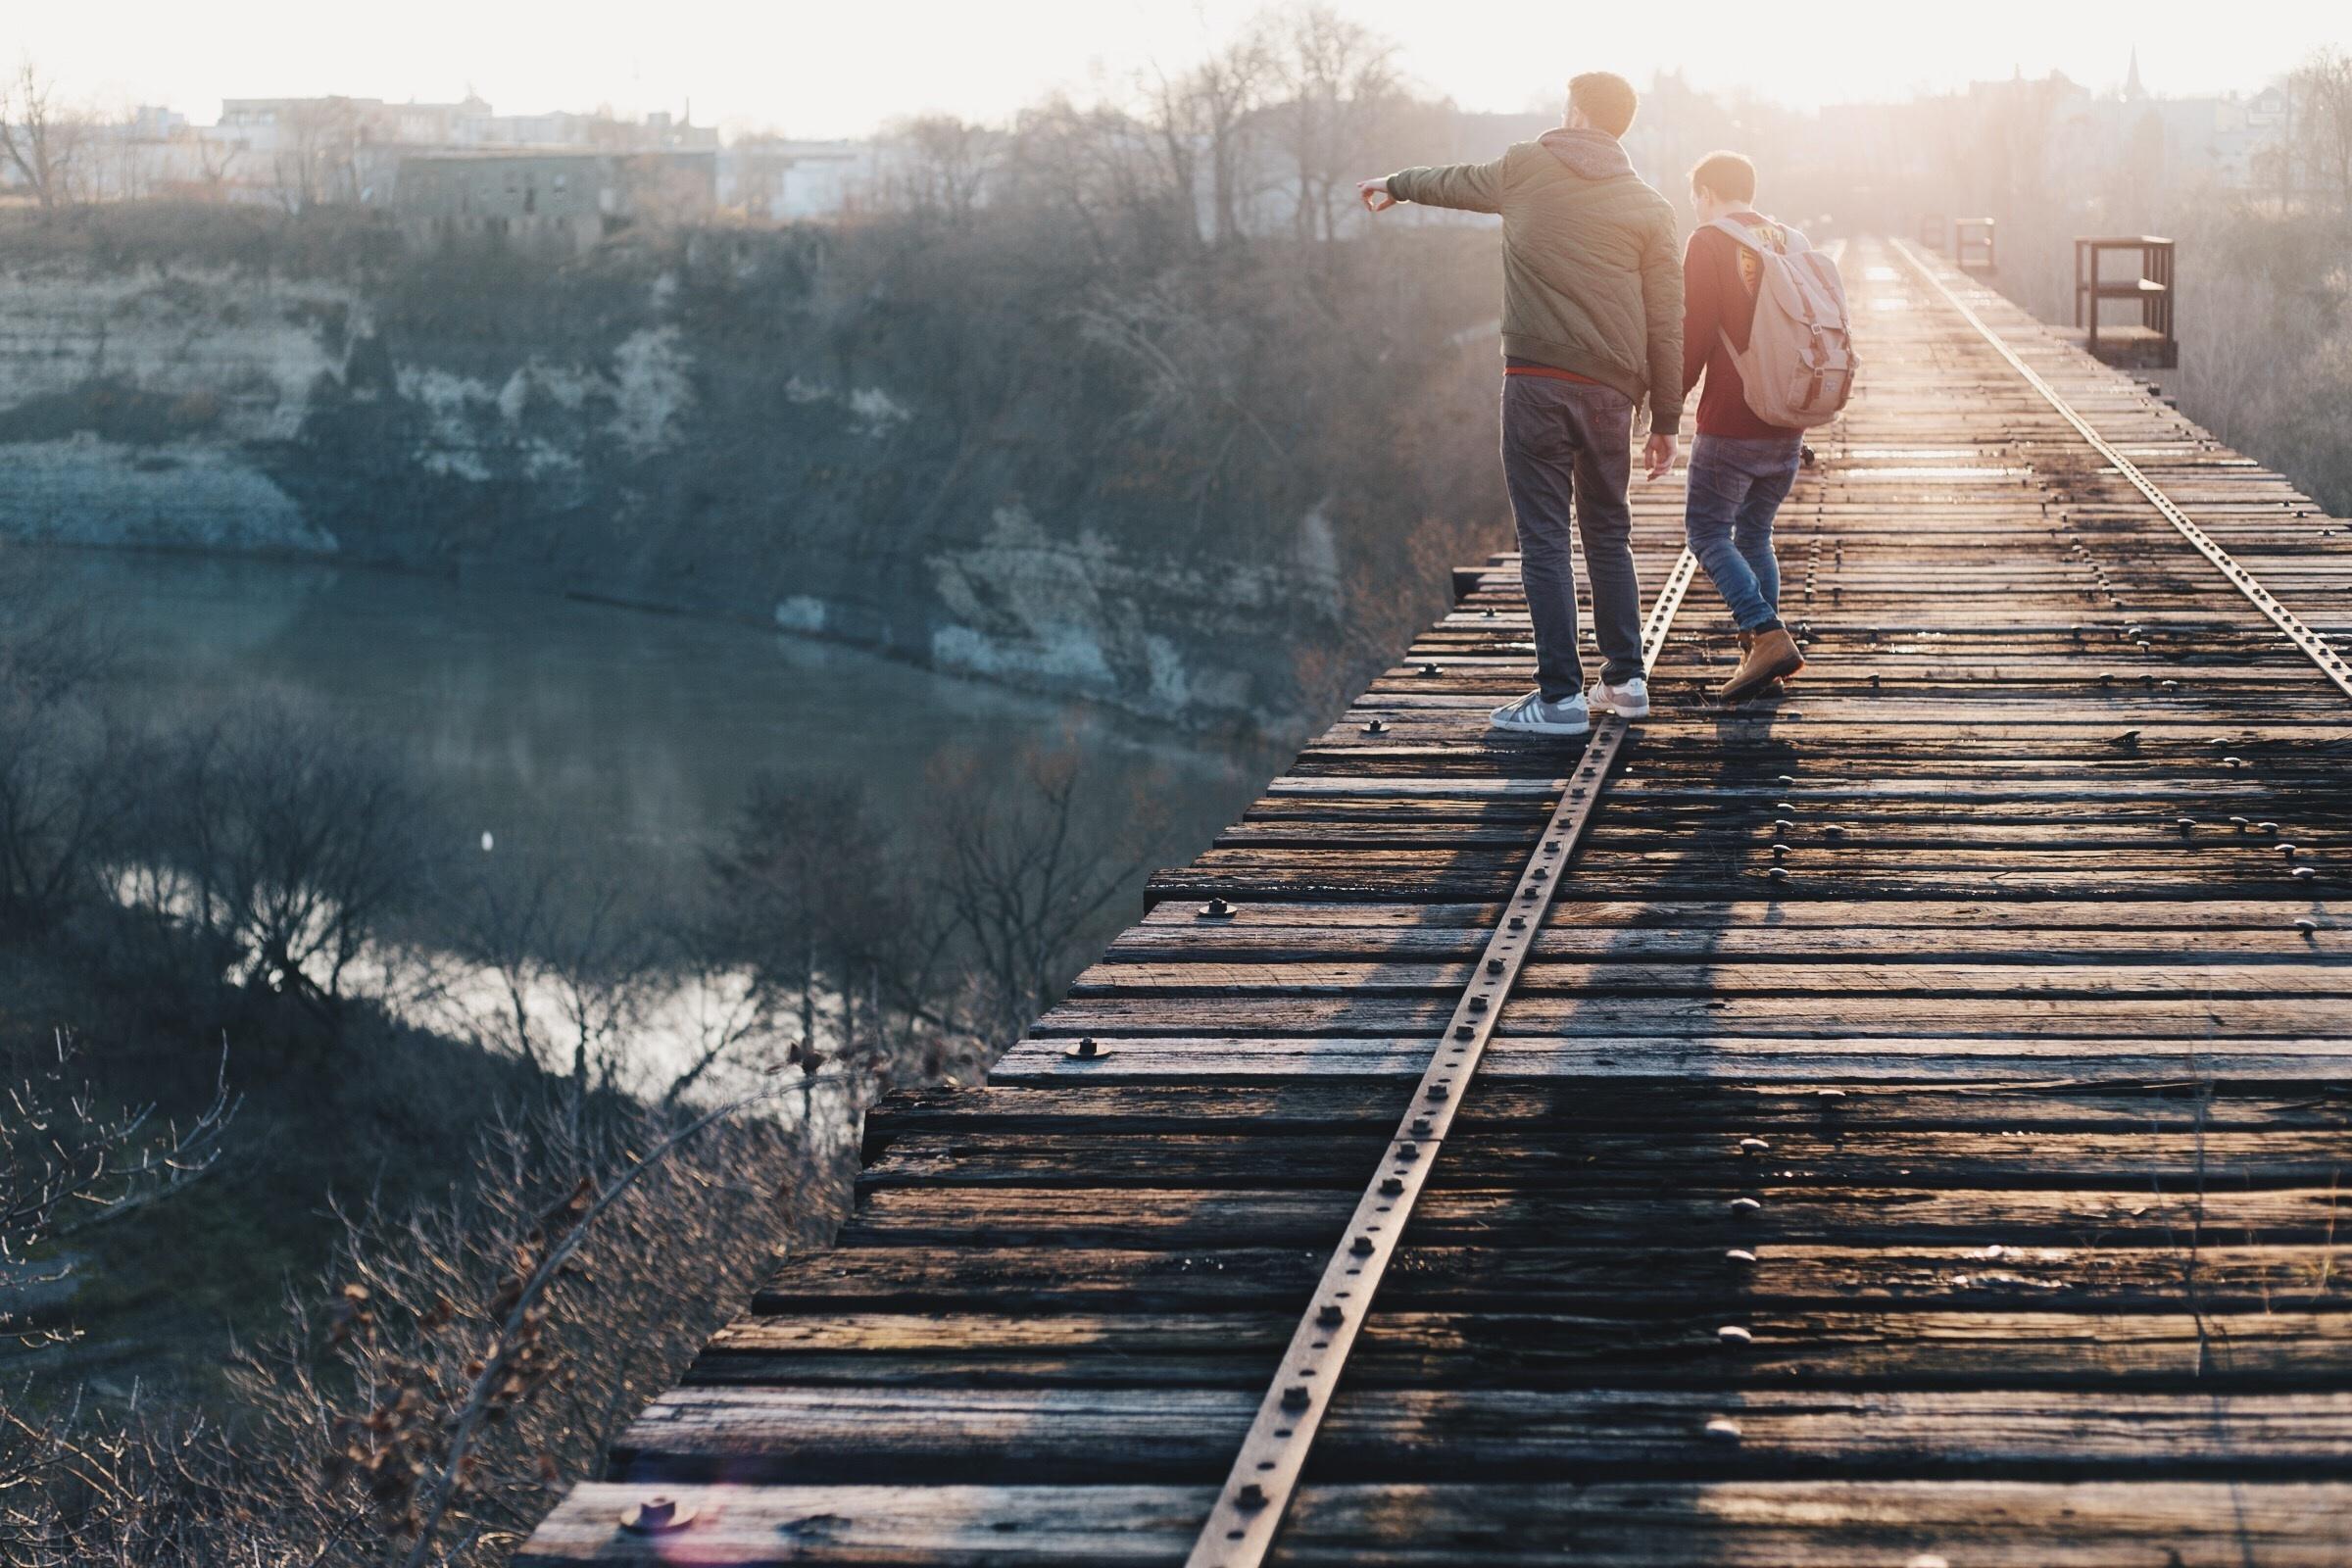 картинки на мосту человека этого